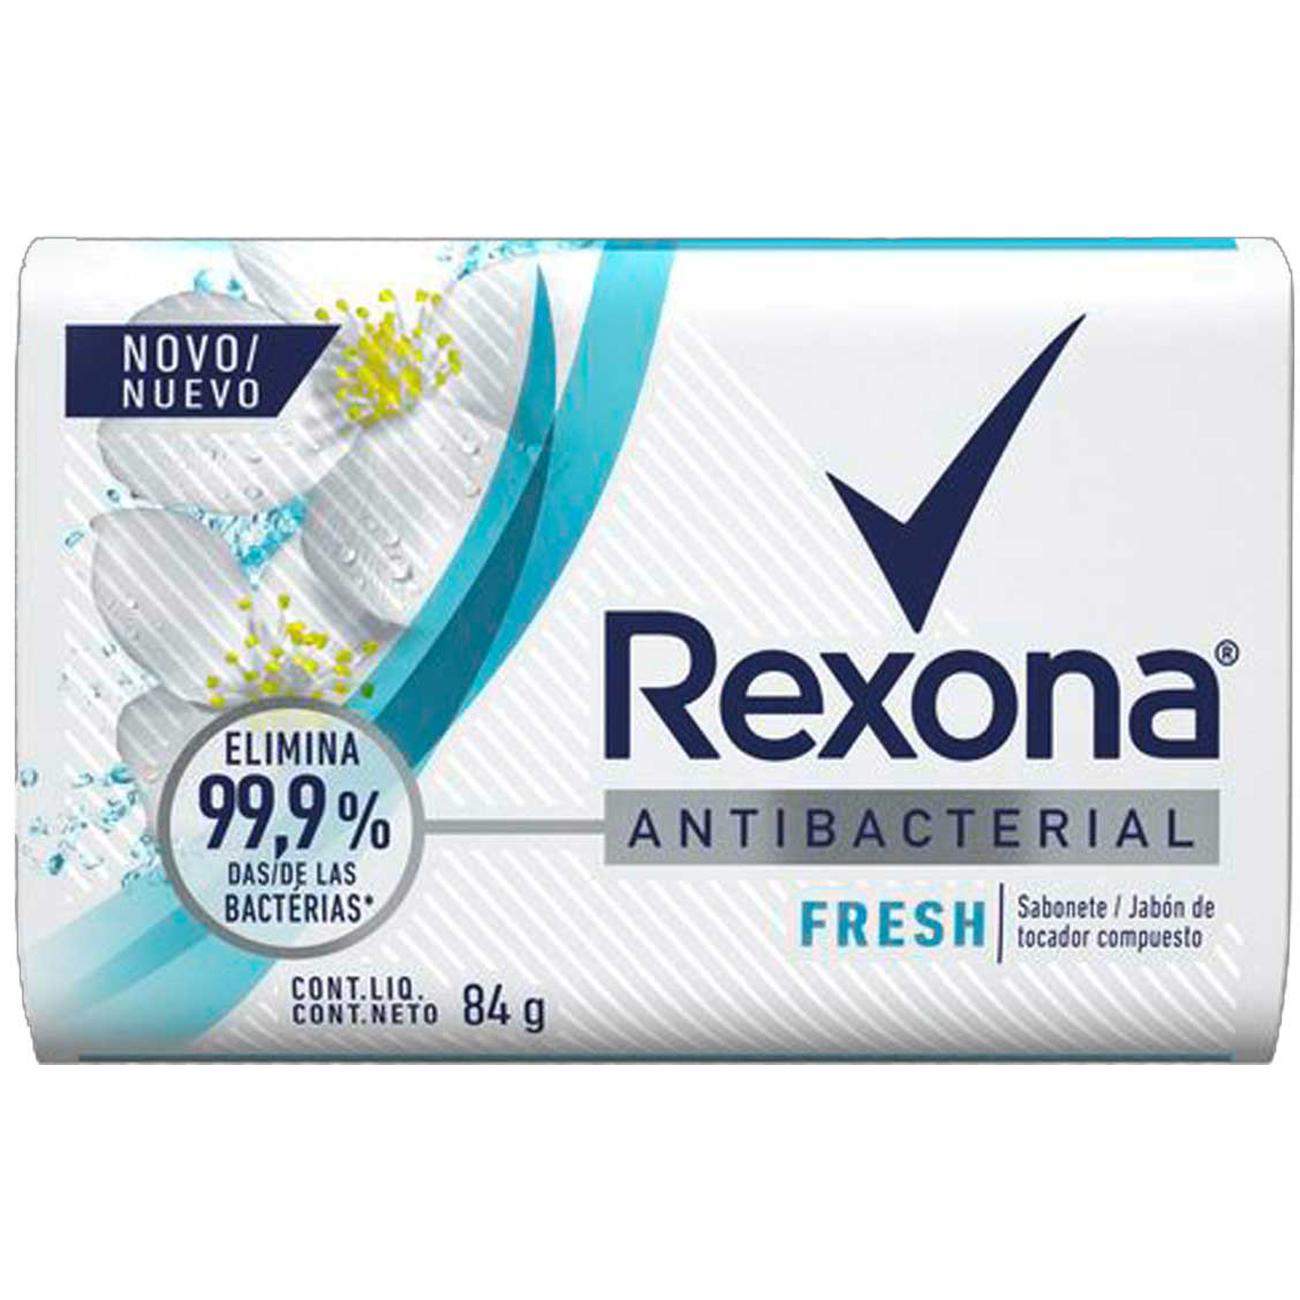 Sabonete em Barra Antibacteriano Rexona 84G